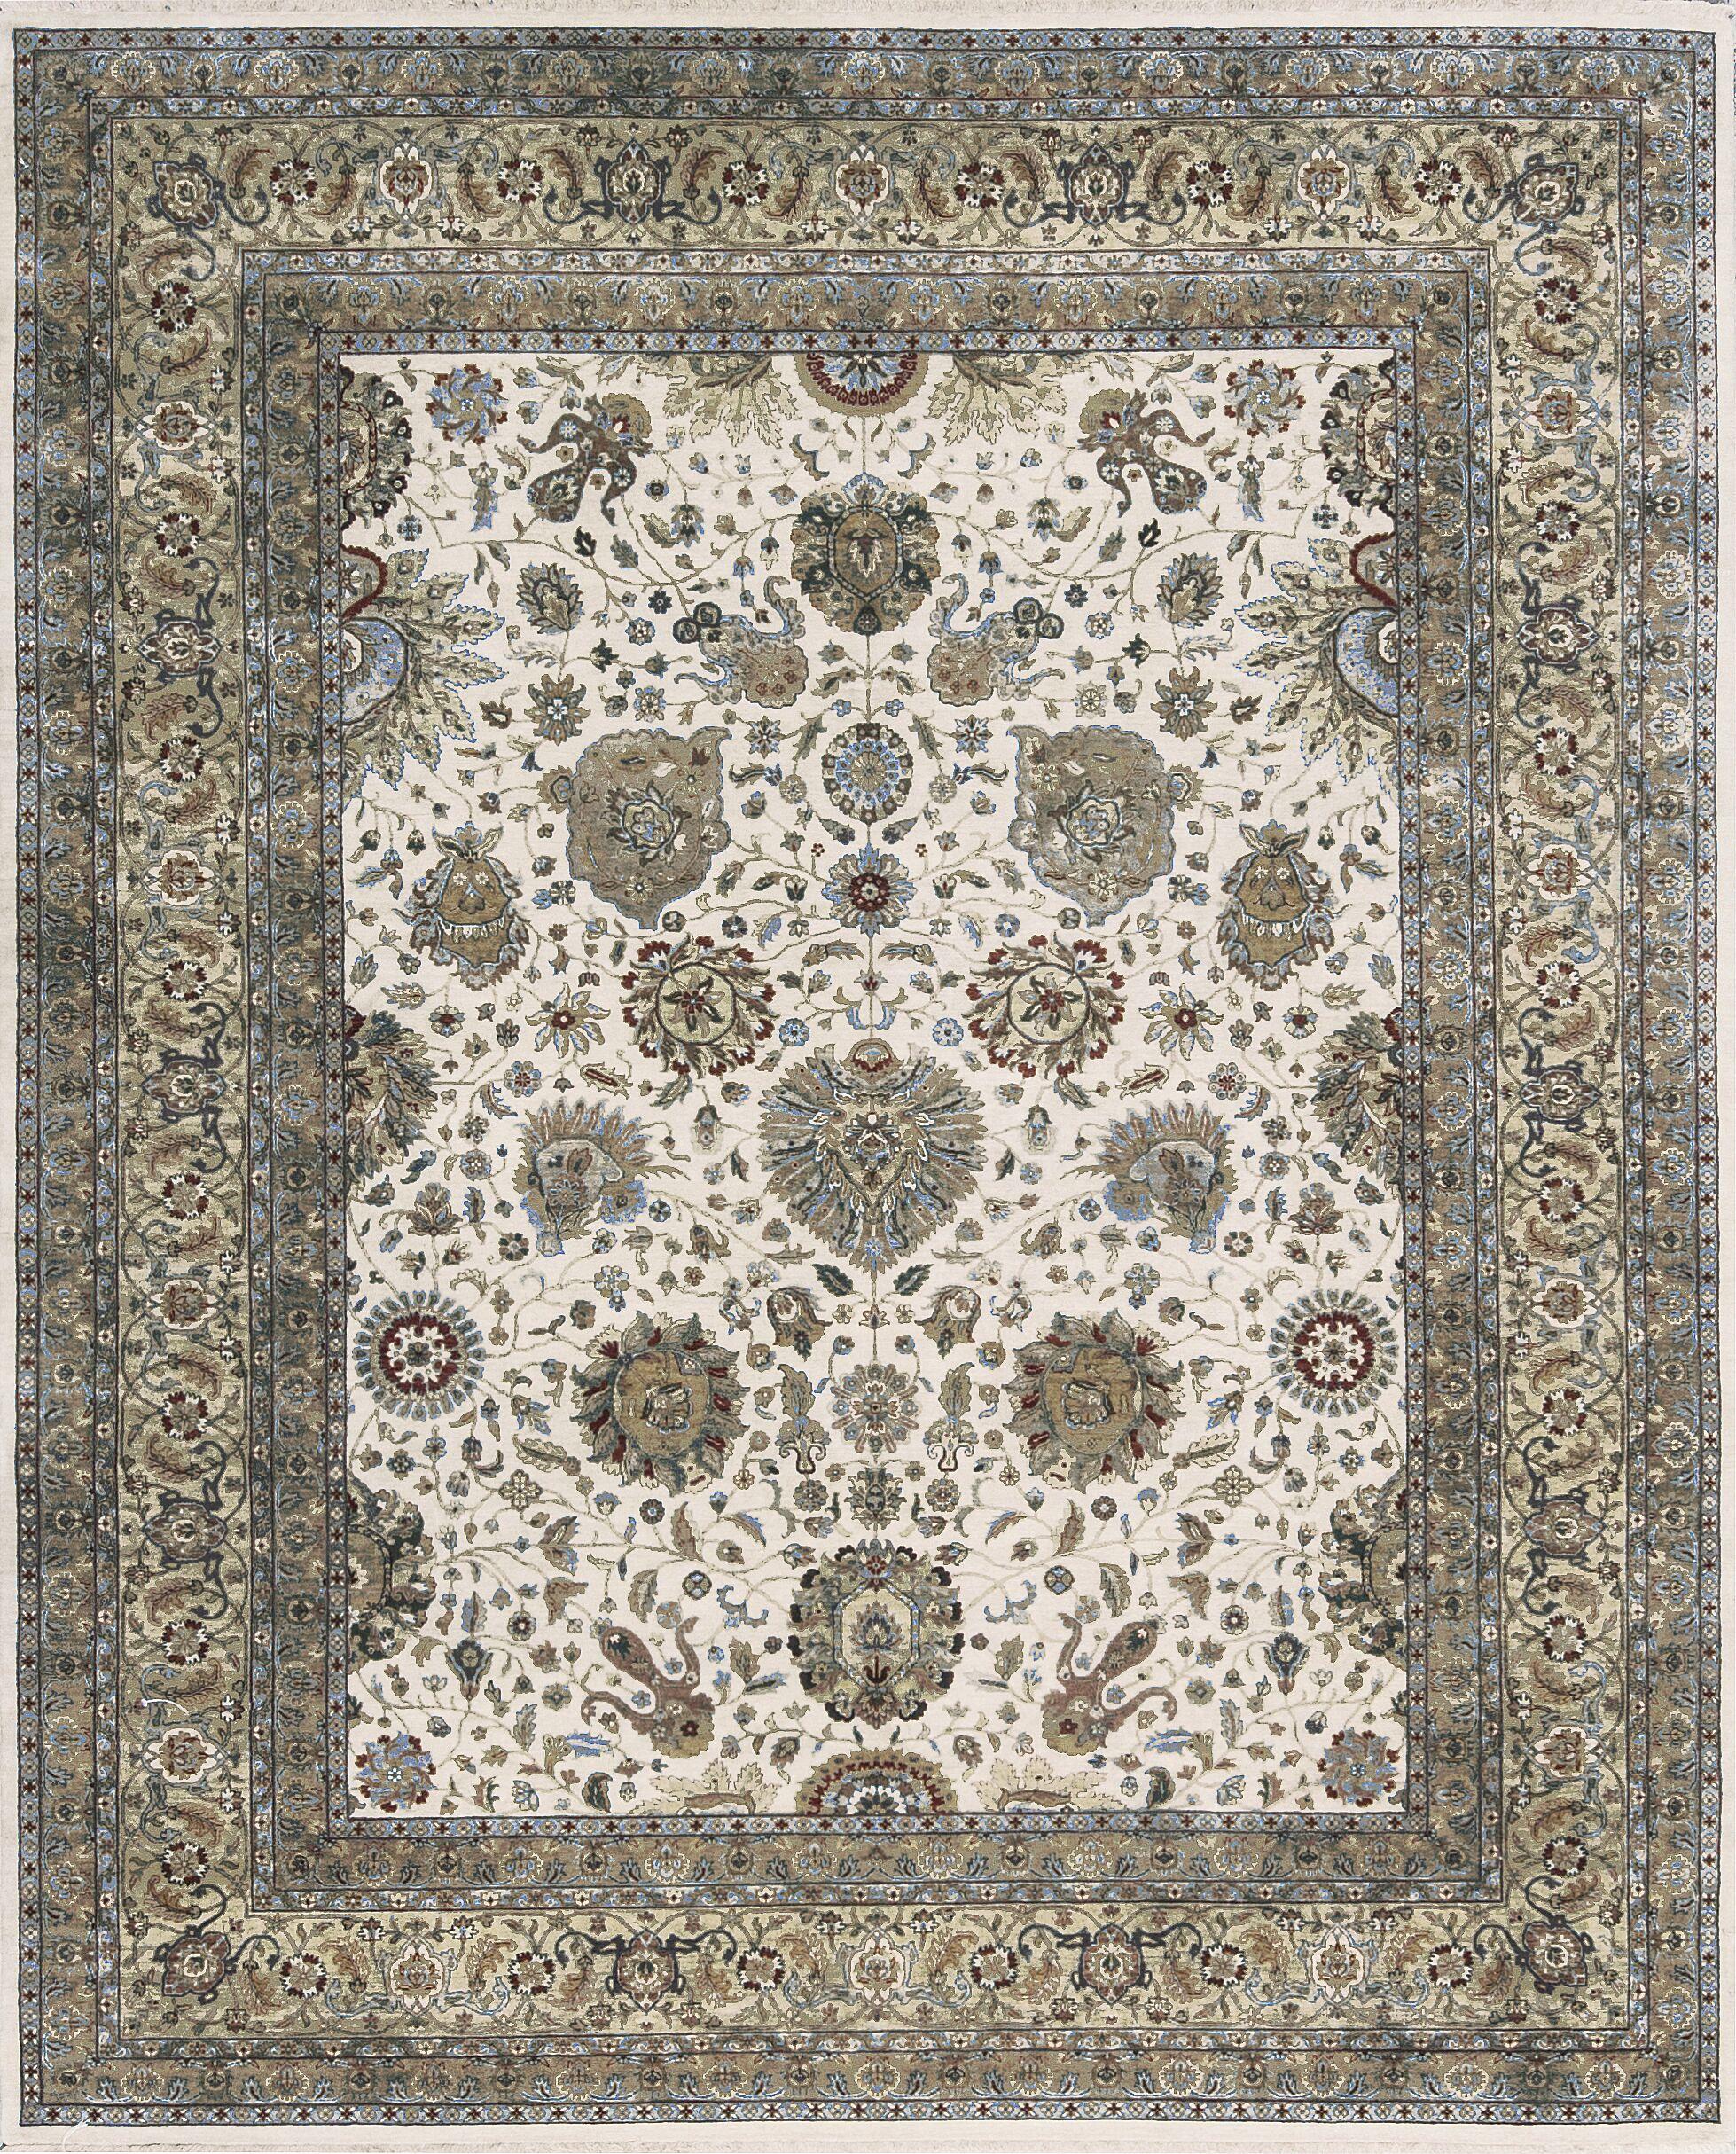 One-of-a-Kind Kashan Handwoven Wool Ivory/Beige Indoor Area Rug